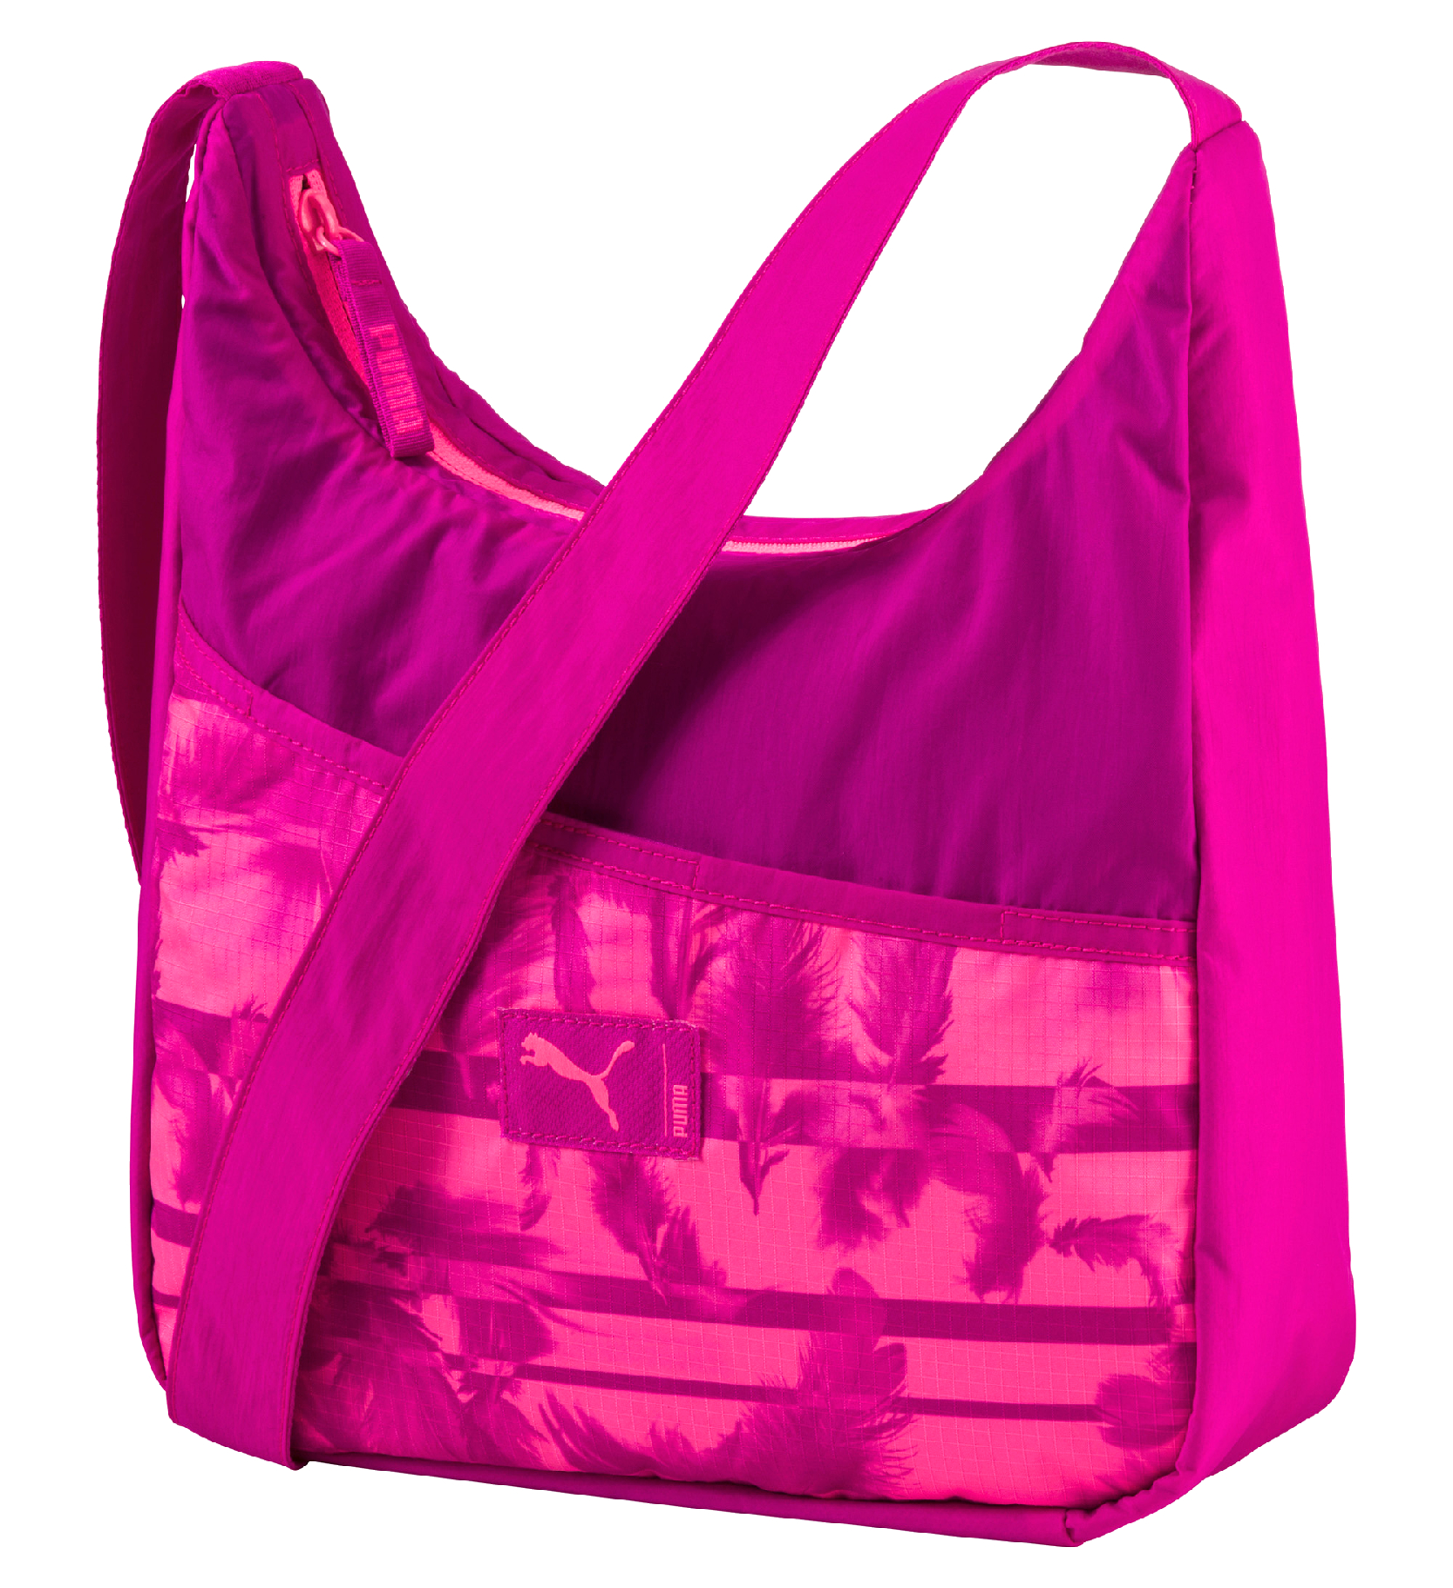 b4b7c0e8e9 Dámská taška přes rameno Puma STUDIO SMALL SHOULDER BAG W růžová ...